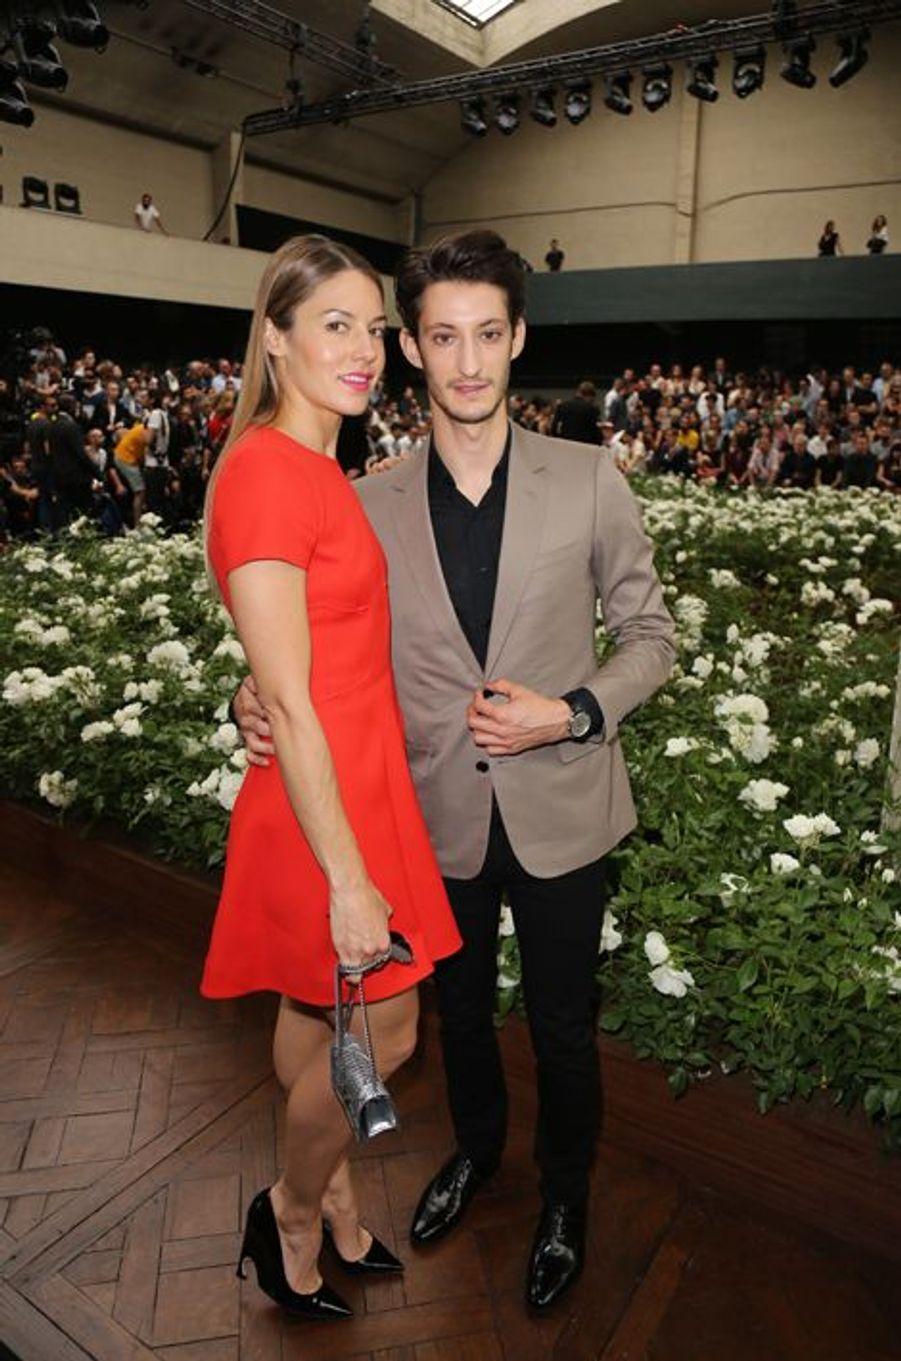 Pierre Niney et sa compagne Natasha Andrews